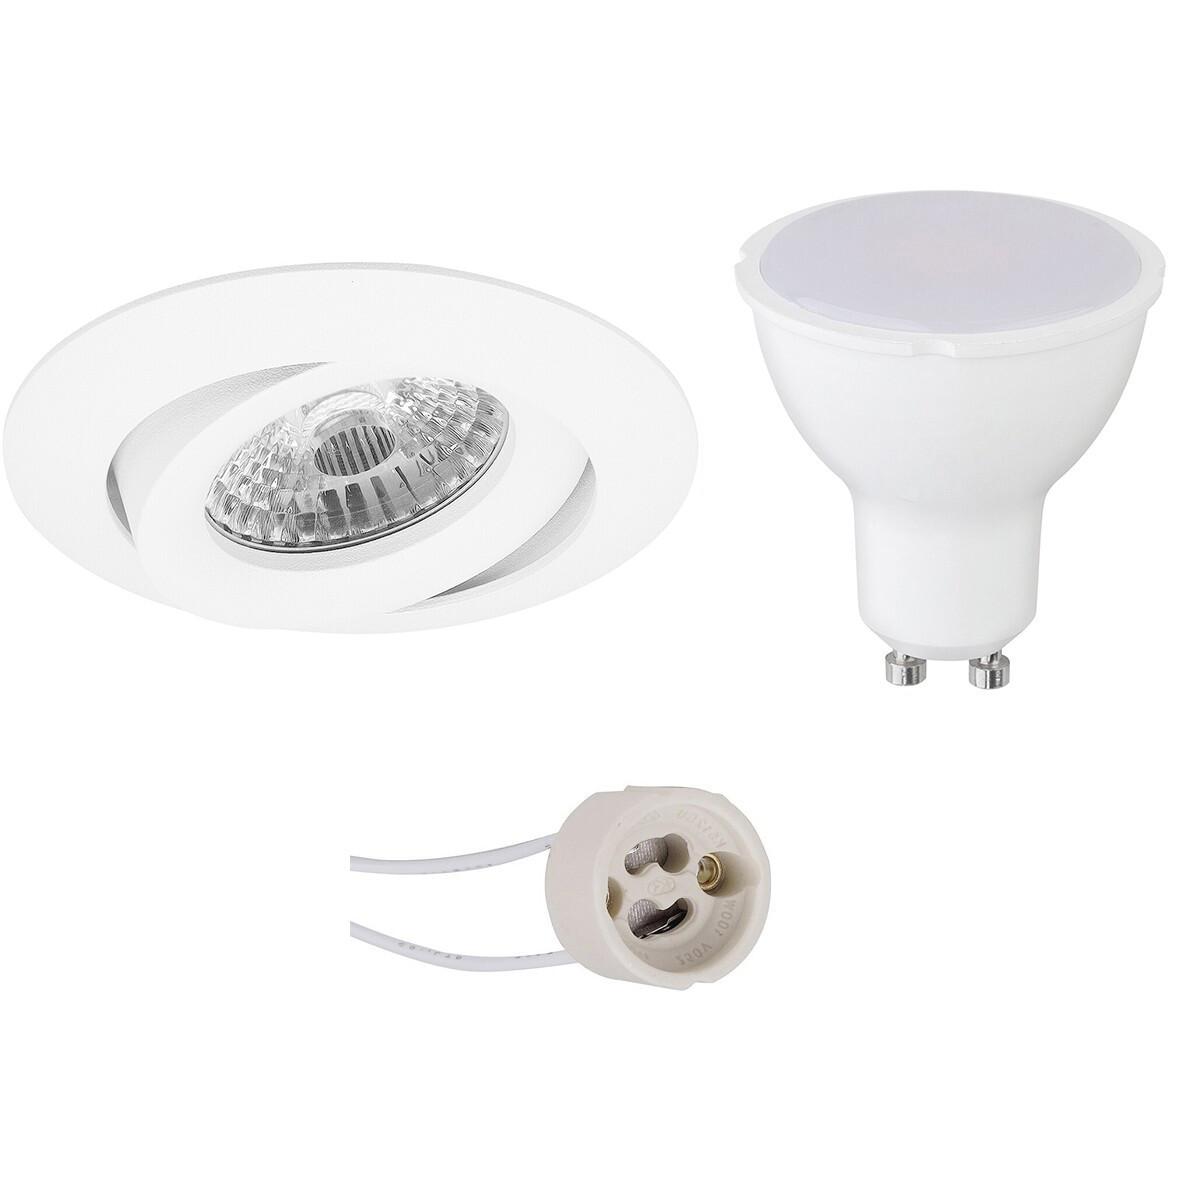 LED Spot Set - Pragmi Uranio Pro - GU10 Fitting - Dimbaar - Inbouw Rond - Mat Wit - 6W - Helder/Koud